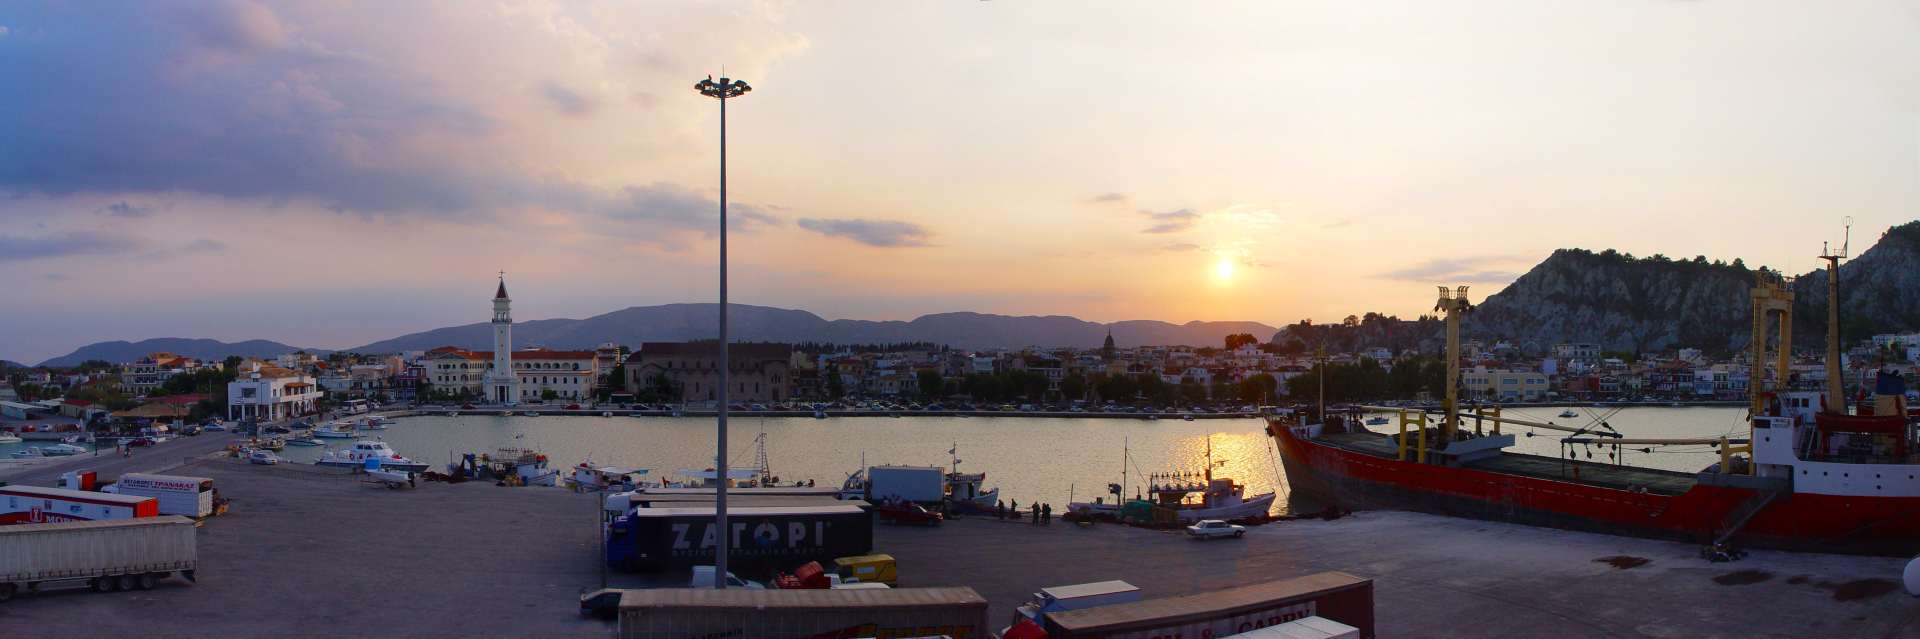 Bild vom Sonnenuntergang am Hafen auf Zakynthos